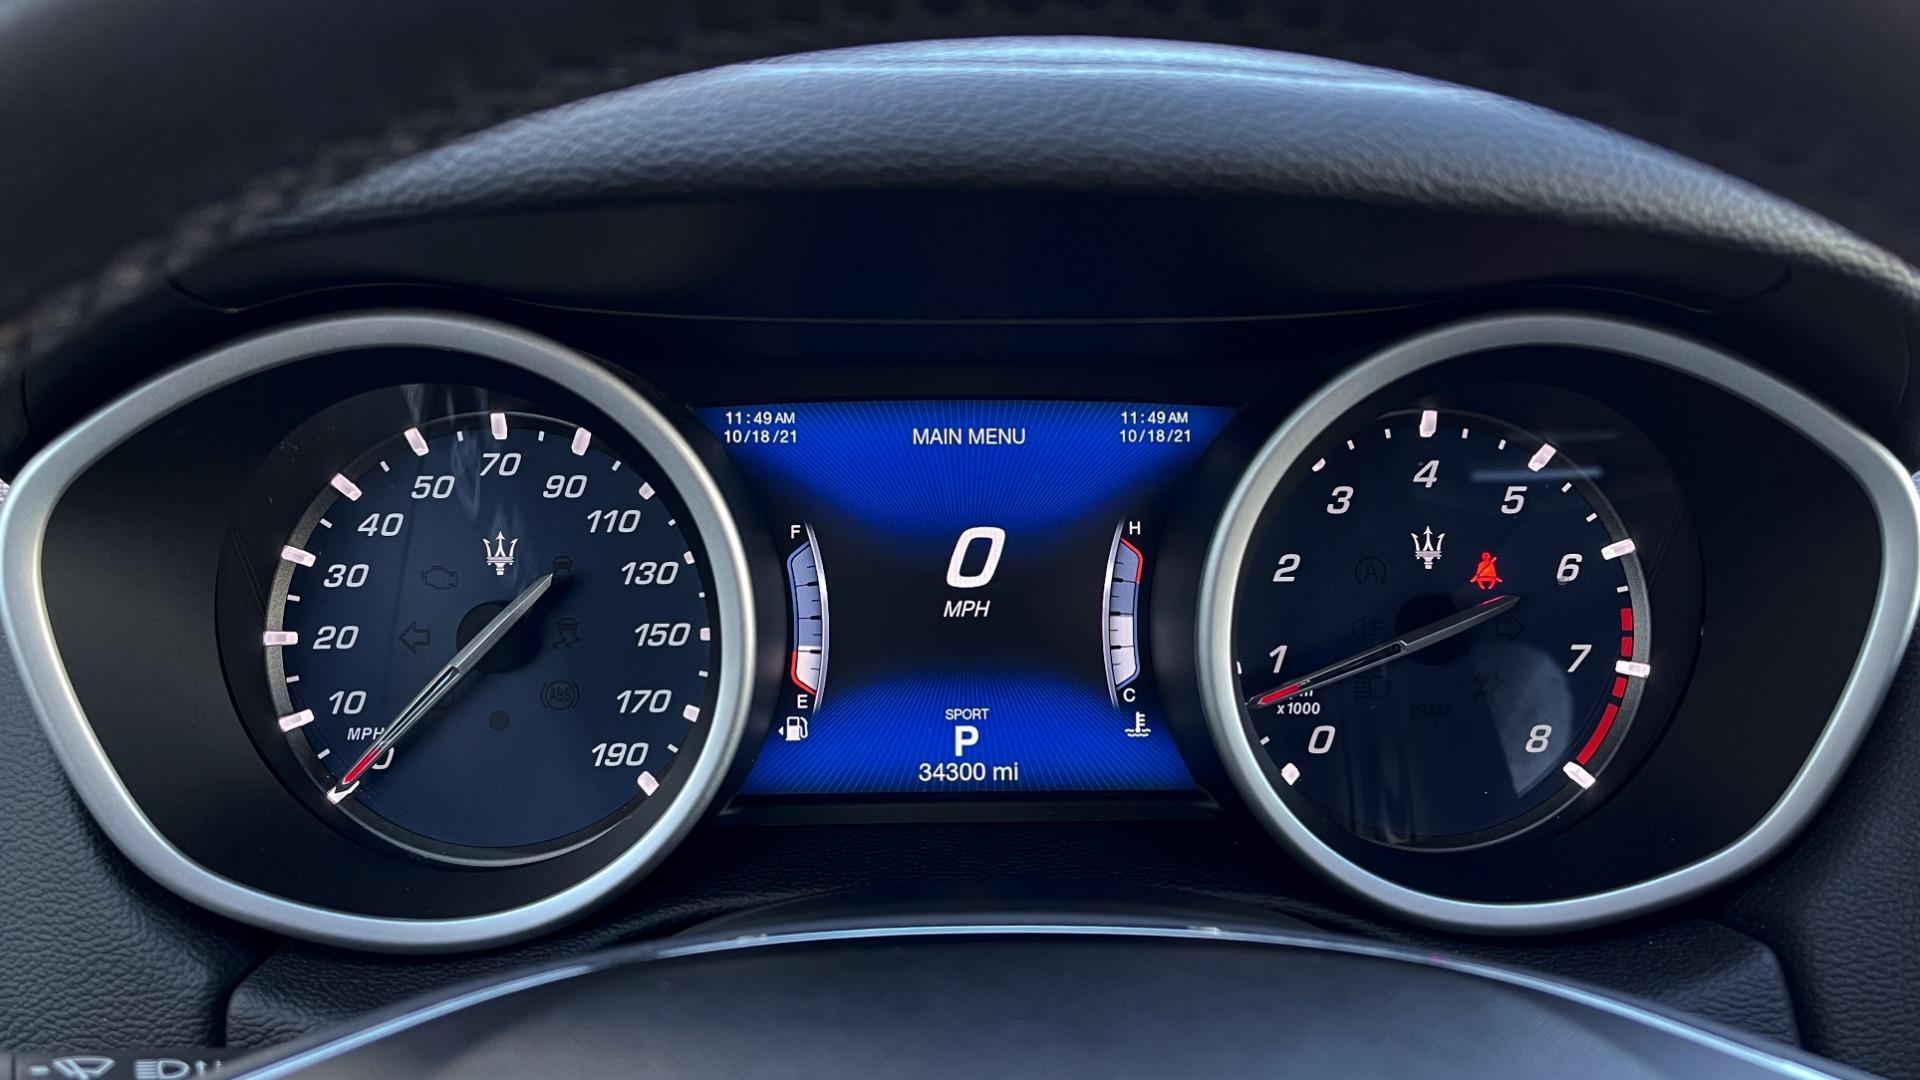 Used 2018 Maserati GHIBLI SEDAN / RWD / 3.0L V6 / SUNROOF / NAV / REARVIEW for sale $42,995 at Formula Imports in Charlotte NC 28227 36